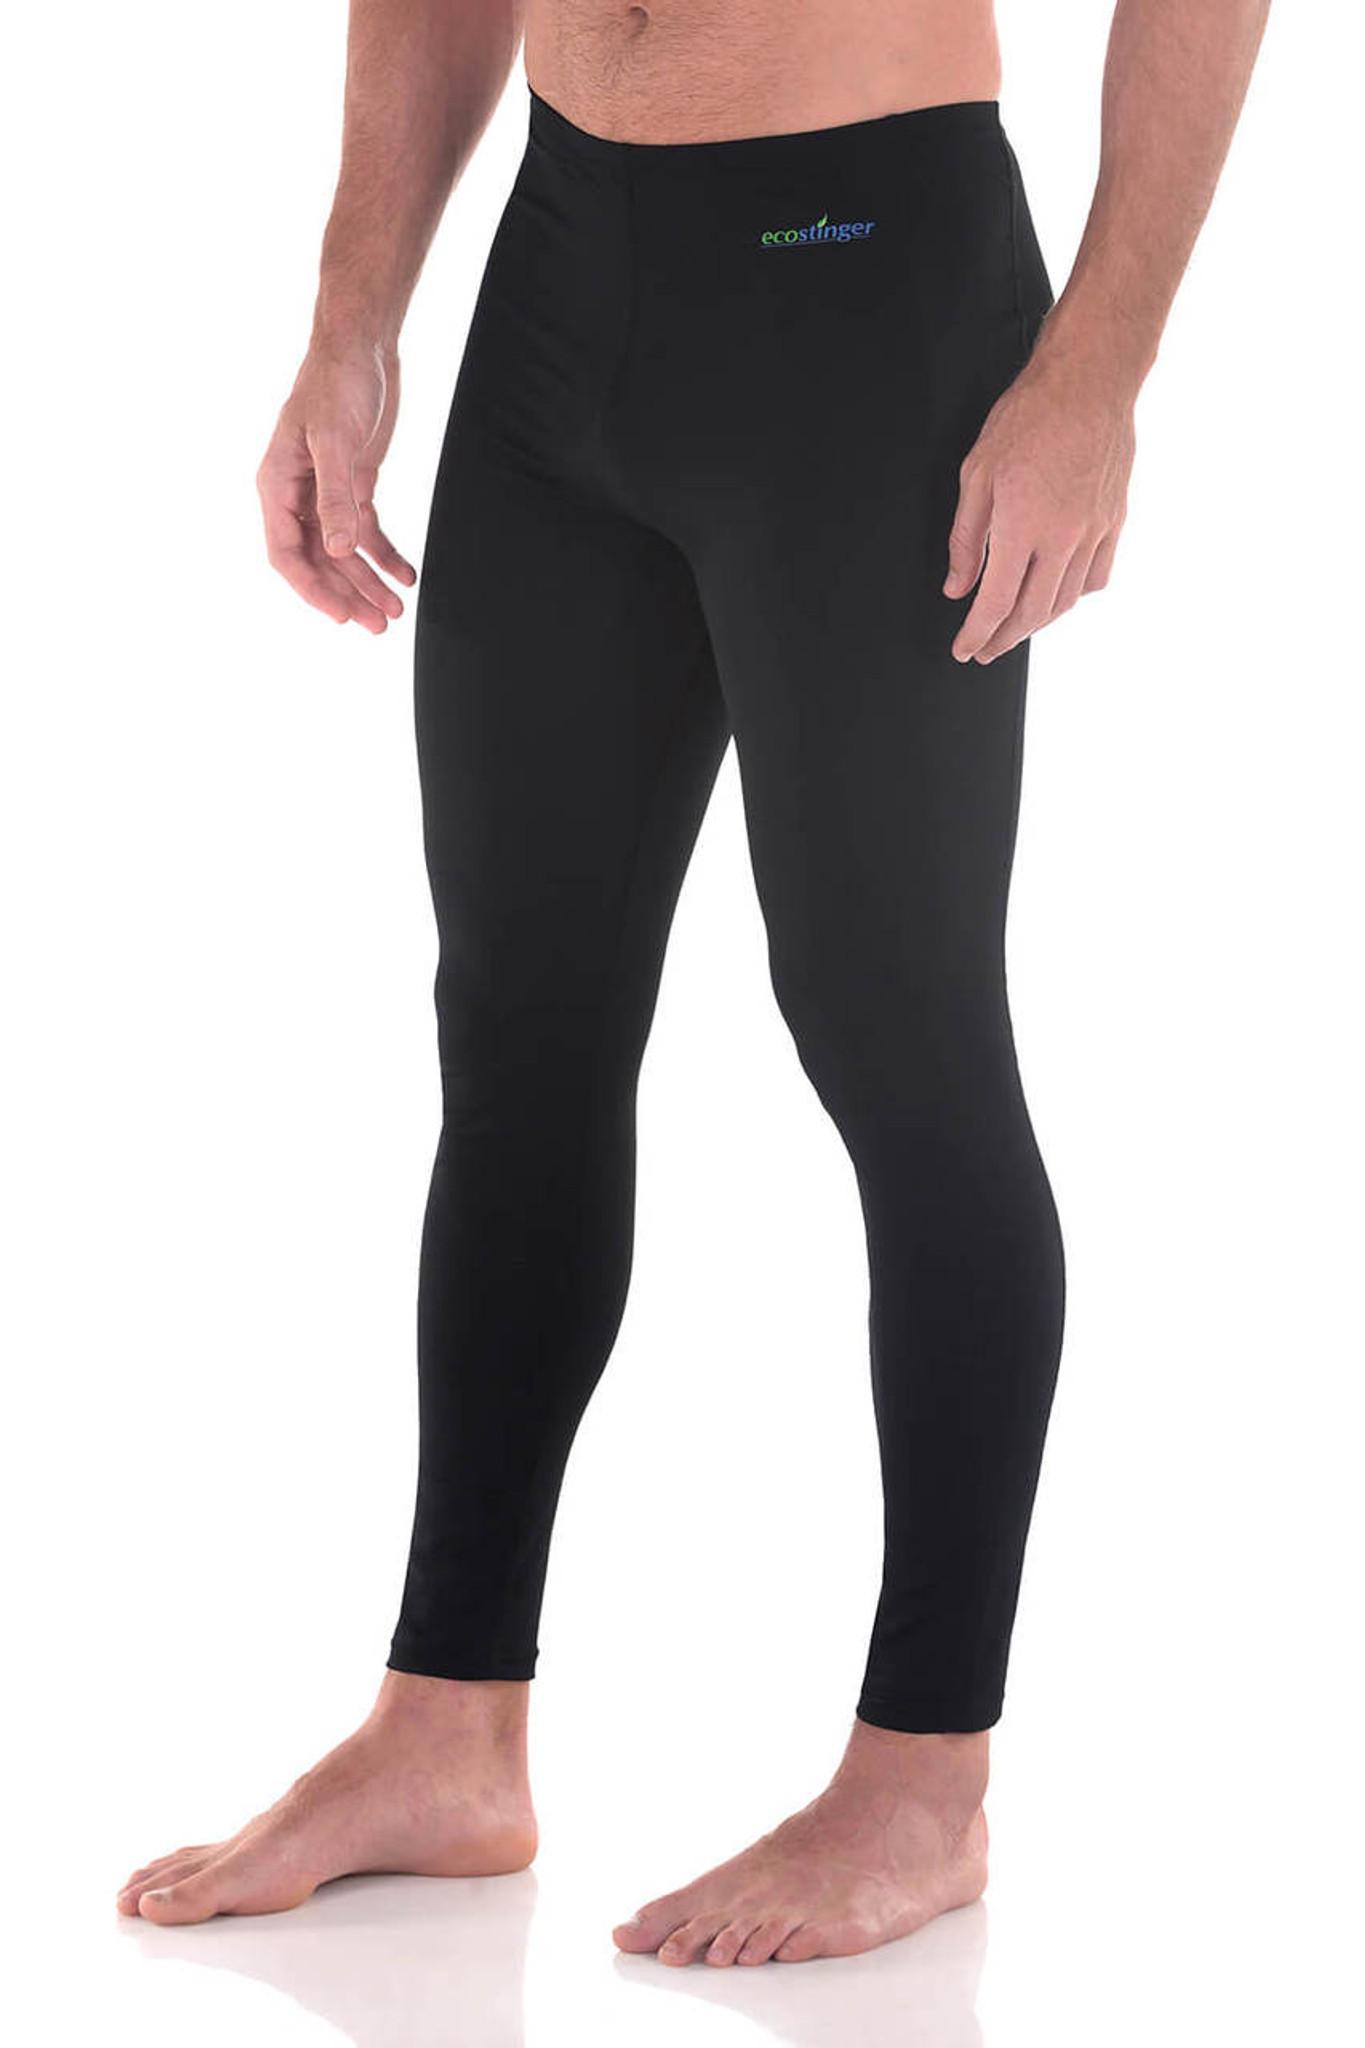 842f33d85 Men Sun Protective Clothing Swim Tights Full Legs UPF50+ Black (Chlorine  Resistant)